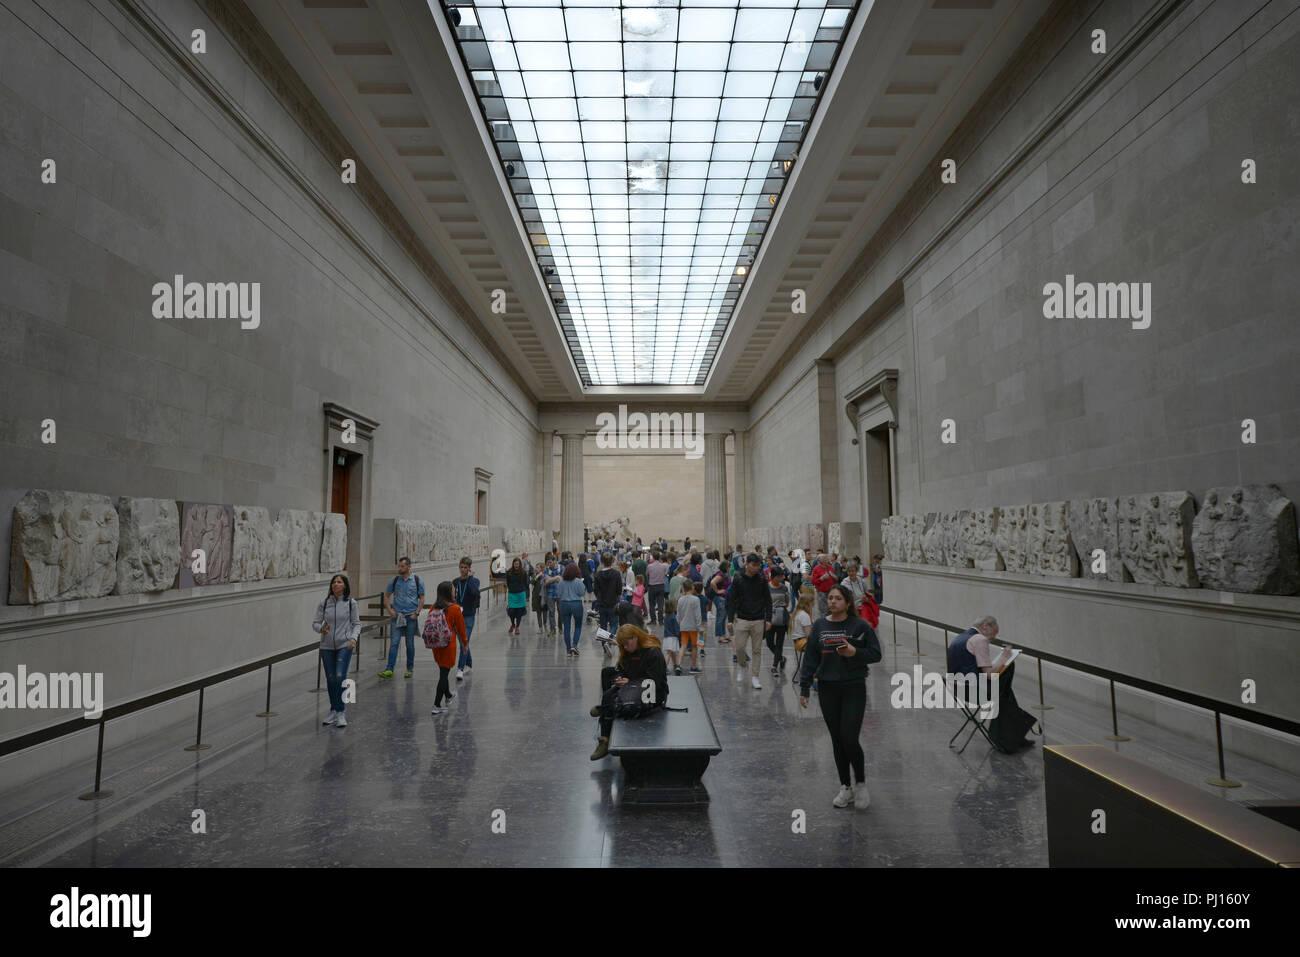 Abteilung Altertum, British Museum, Great Russell St, Bloomsbury, London, Grossbritannien - Stock Image